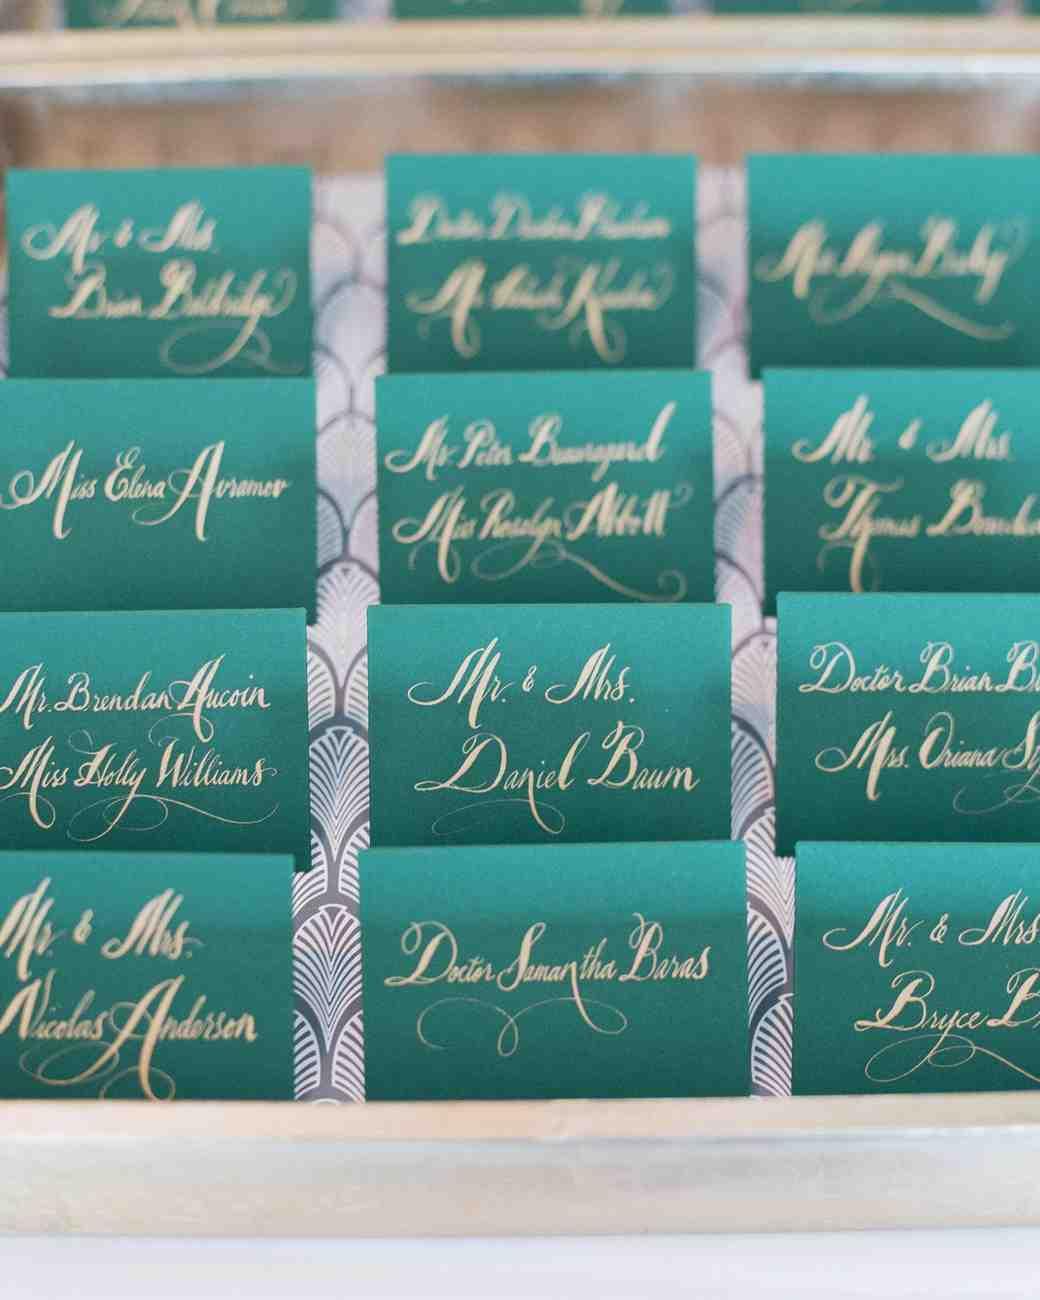 lissy-steven-wedding-newport-escortcards-185-elizabethmessina-s112907-0516.jpg